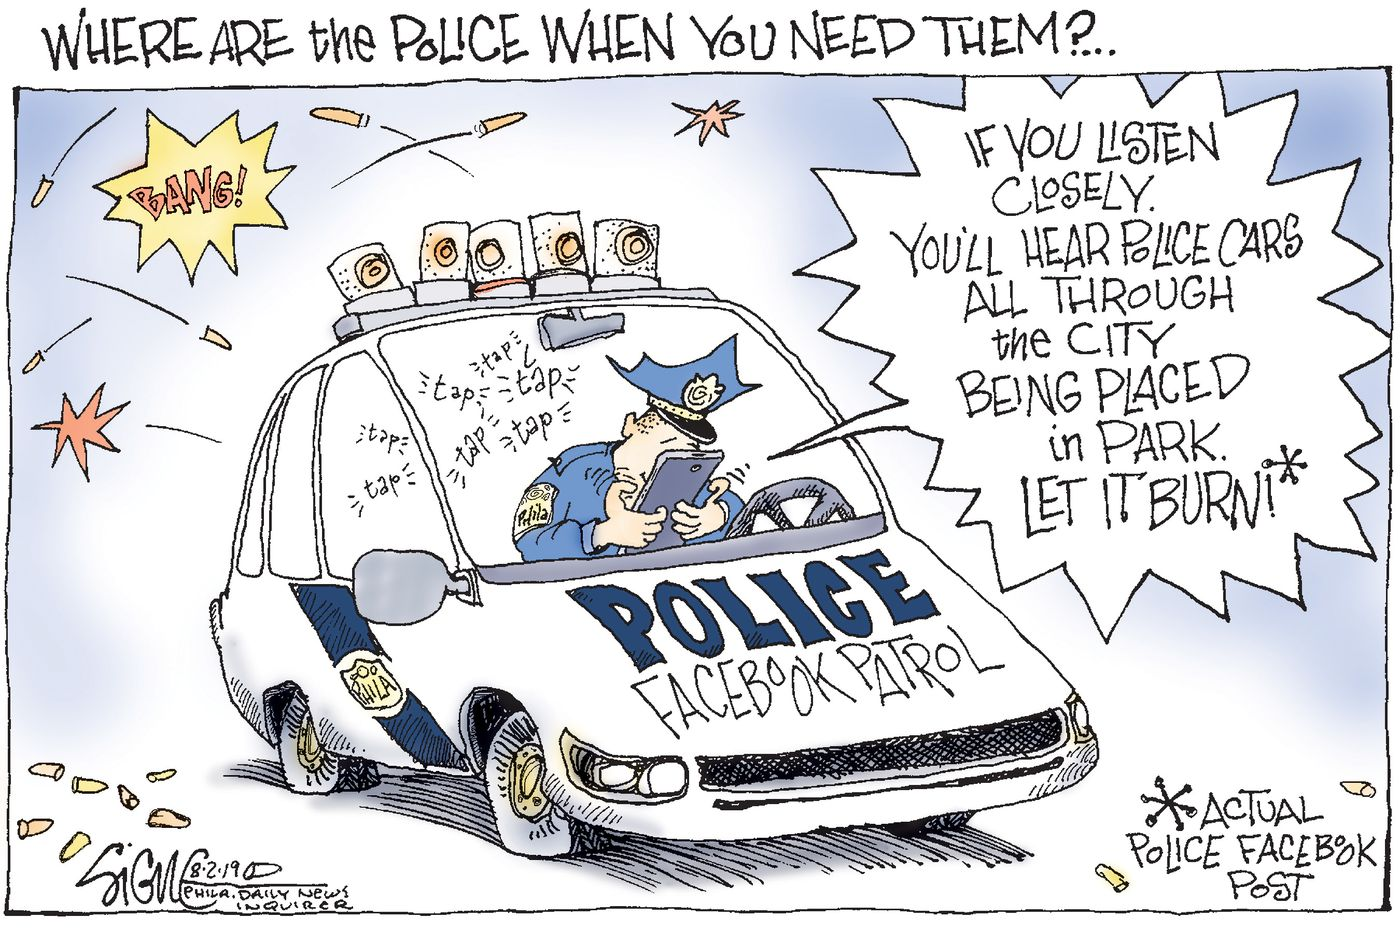 Political Cartoon: Philadelphia's Police Facebook squad